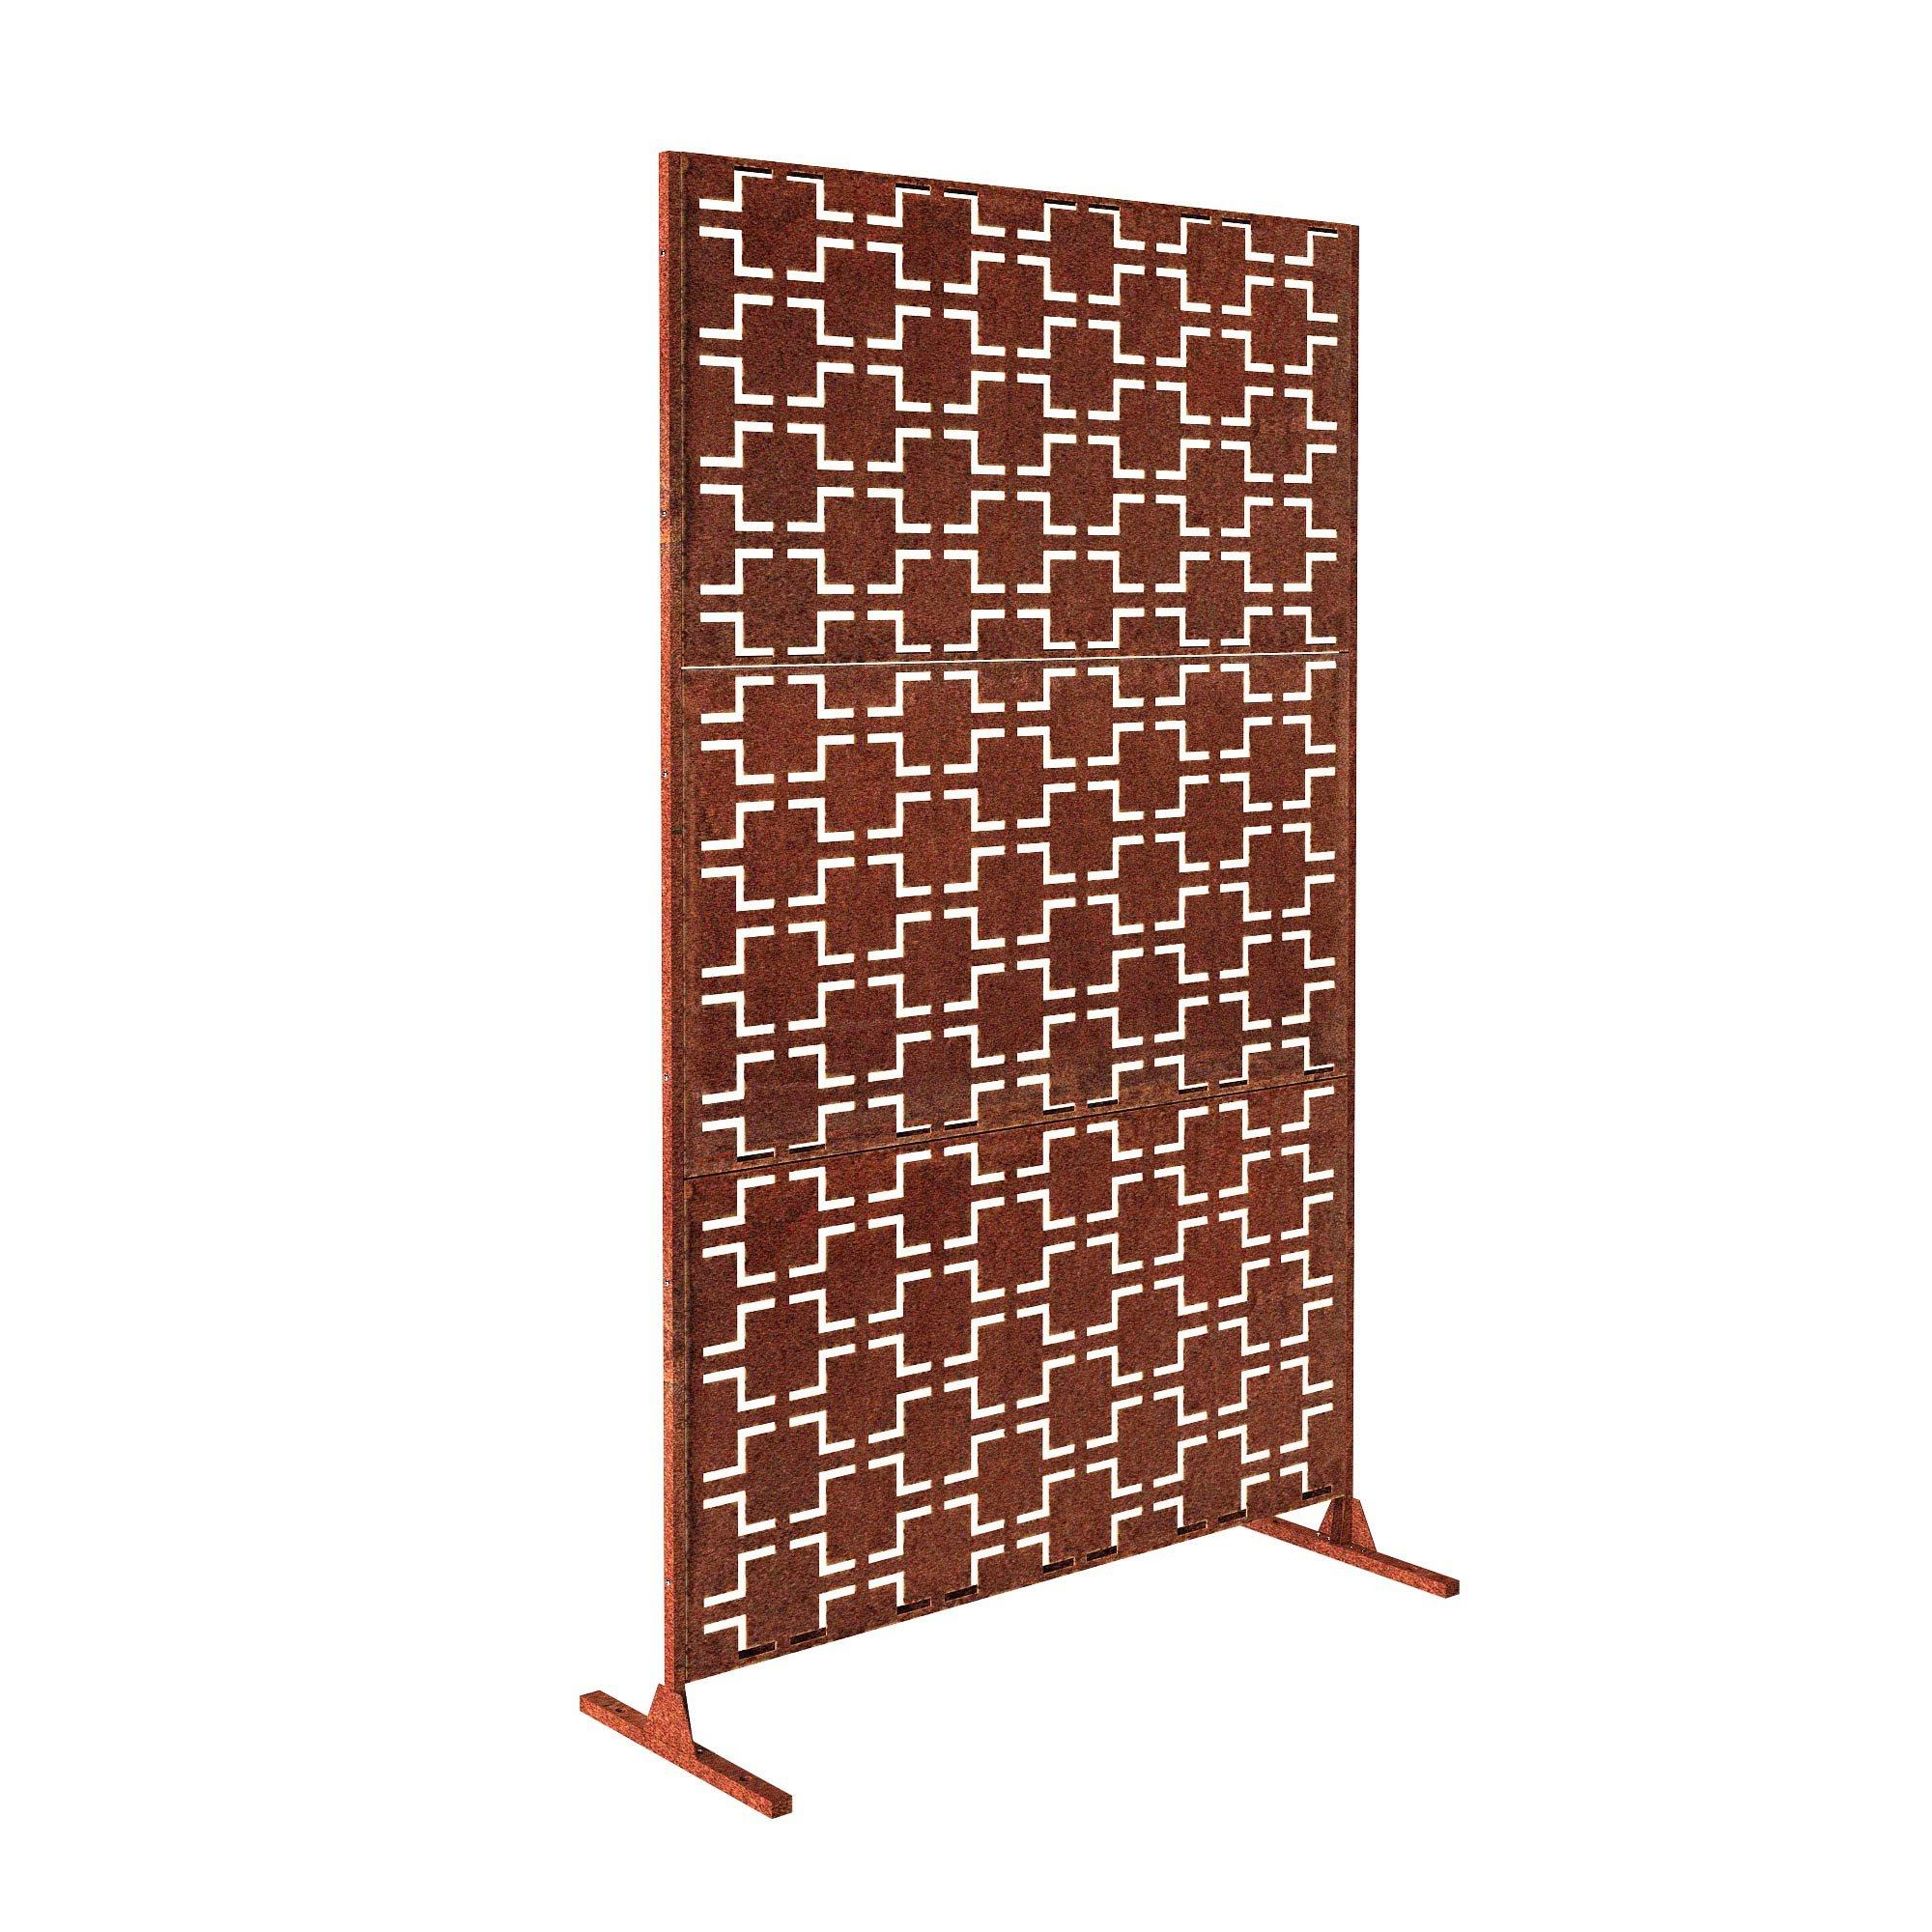 Veradek Quadra Decorative Screen Set w/Stand - Corten Steel